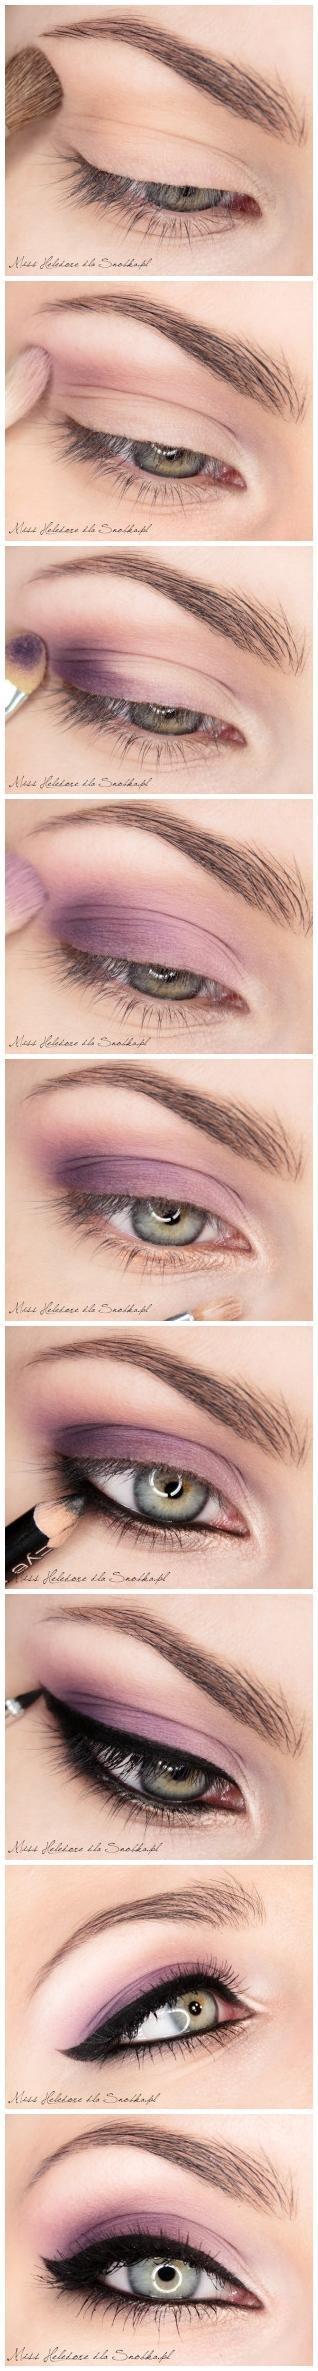 Mariage - Violet Smokey Tutoriel Maquillage des yeux Maquillage ♥ Meilleure nuptiale